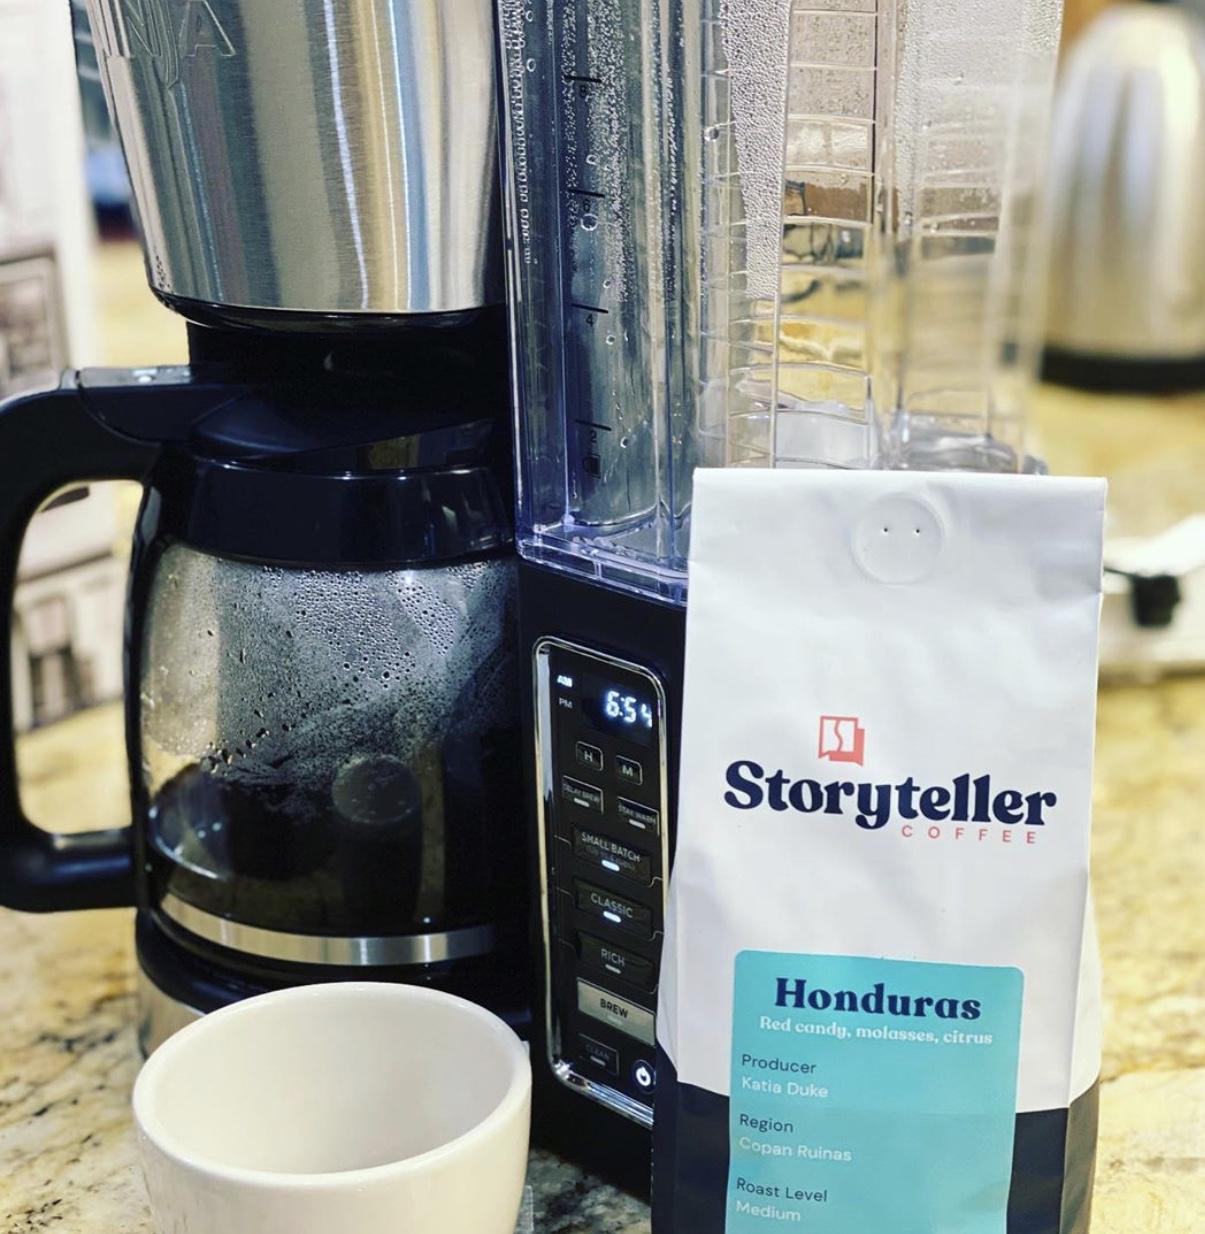 Storyteller Coffee